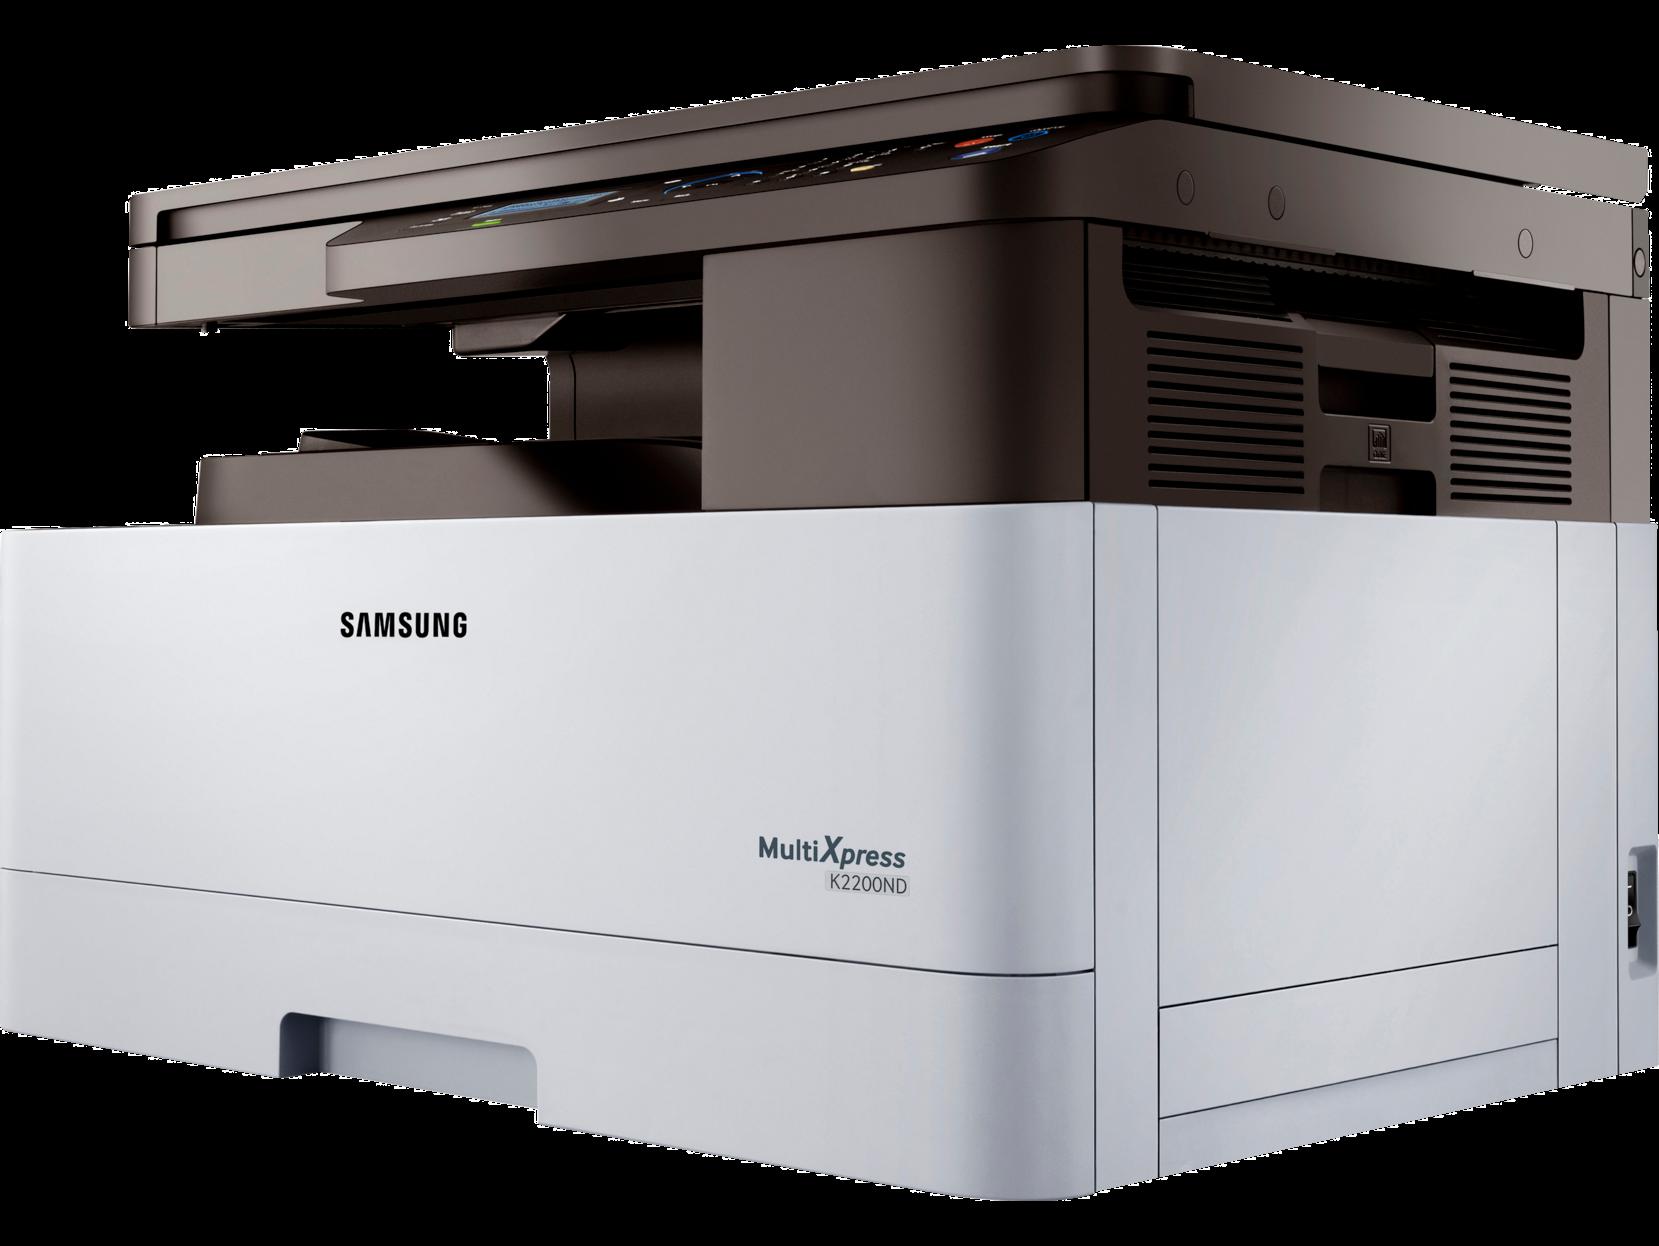 Samsung K2200